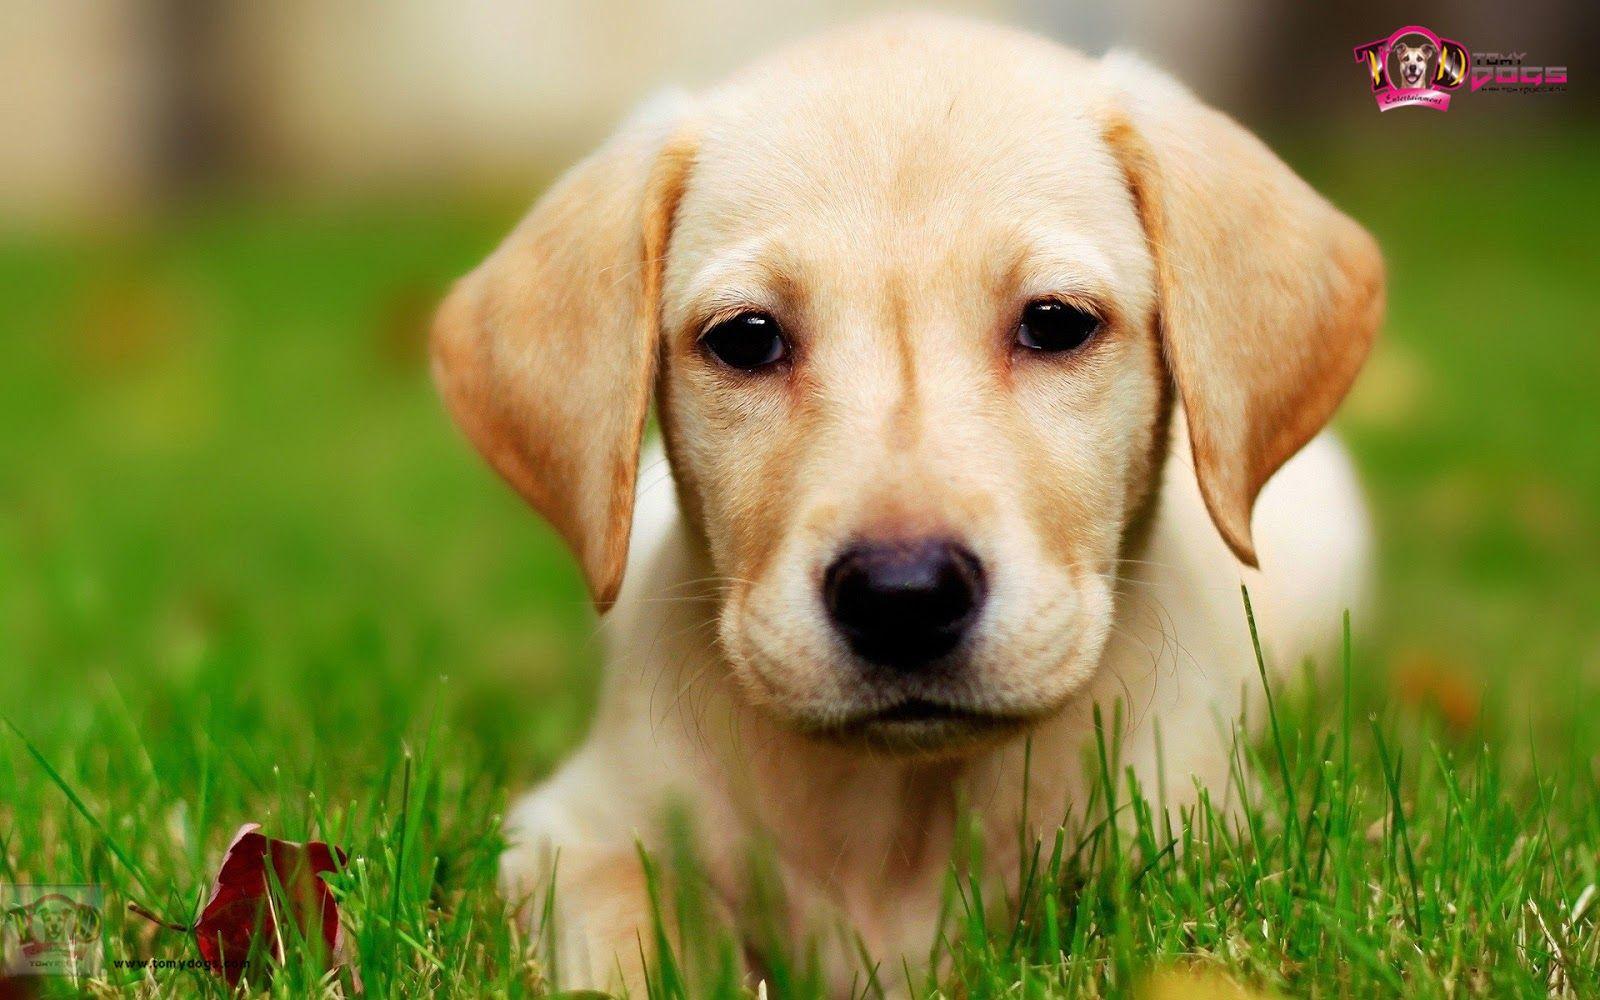 75 Labrador Retriever HD Wallpapers | Backgrounds - Wallpaper ... for Cute Lab Dog Puppy  155fiz